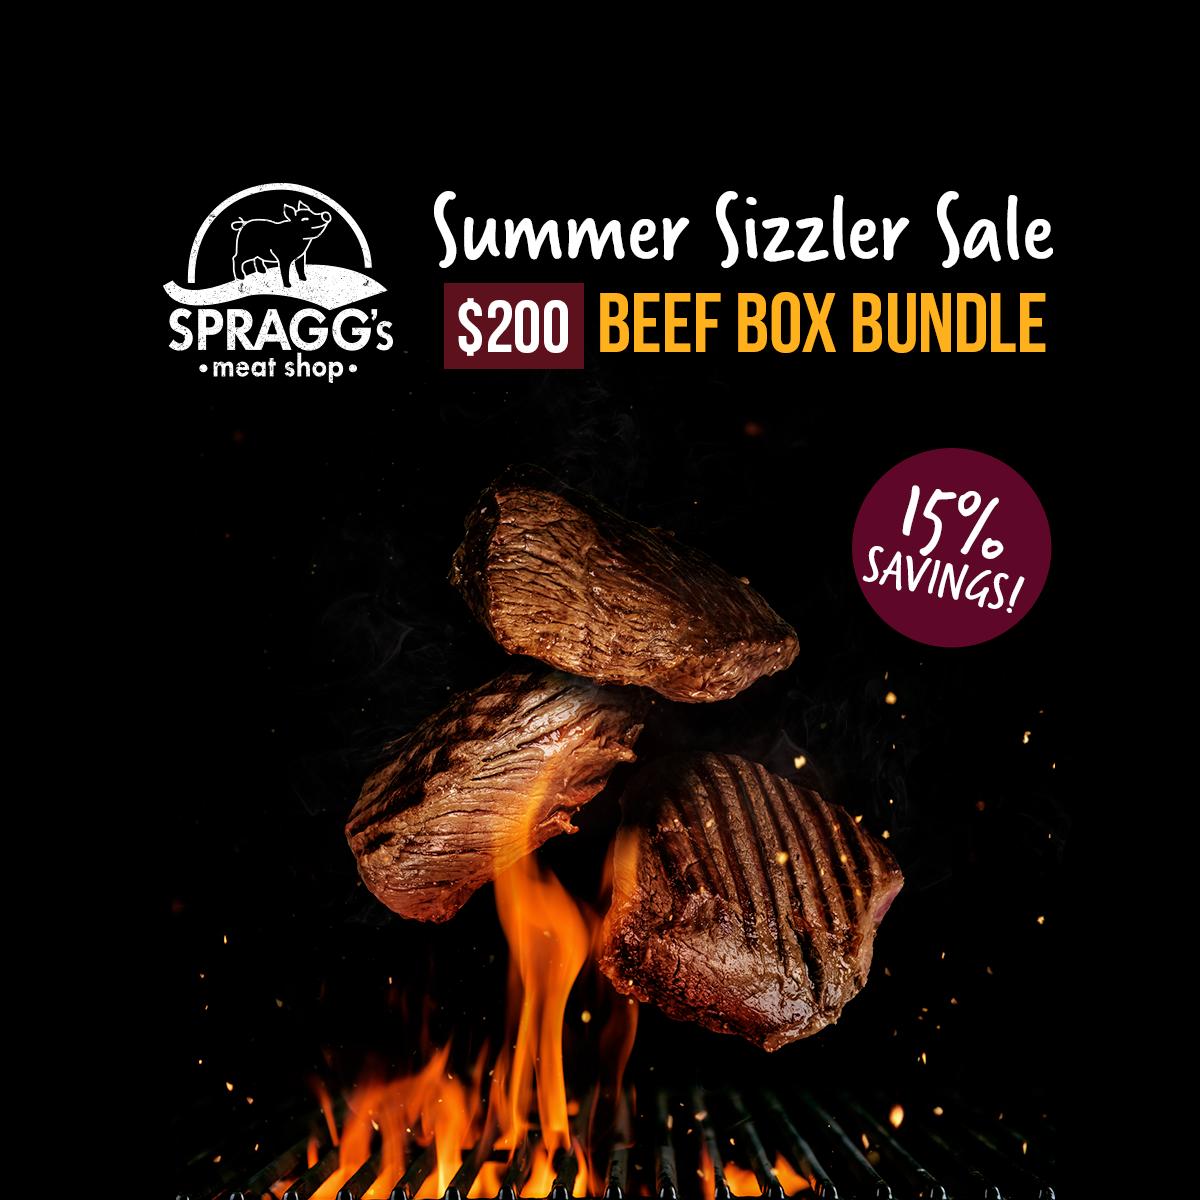 $200 BEEF BOX BUNDLE - - 2 T-Bone Steaks- 2 Prime Rib Steaks- 2 pkgs Top Sirloin Steaks- 3 pkgs Beef Stirfry- 1 3lb Cross Rib Roast- 10 lb Box of Ground BeefAvailable August 1 - August 31, 2019